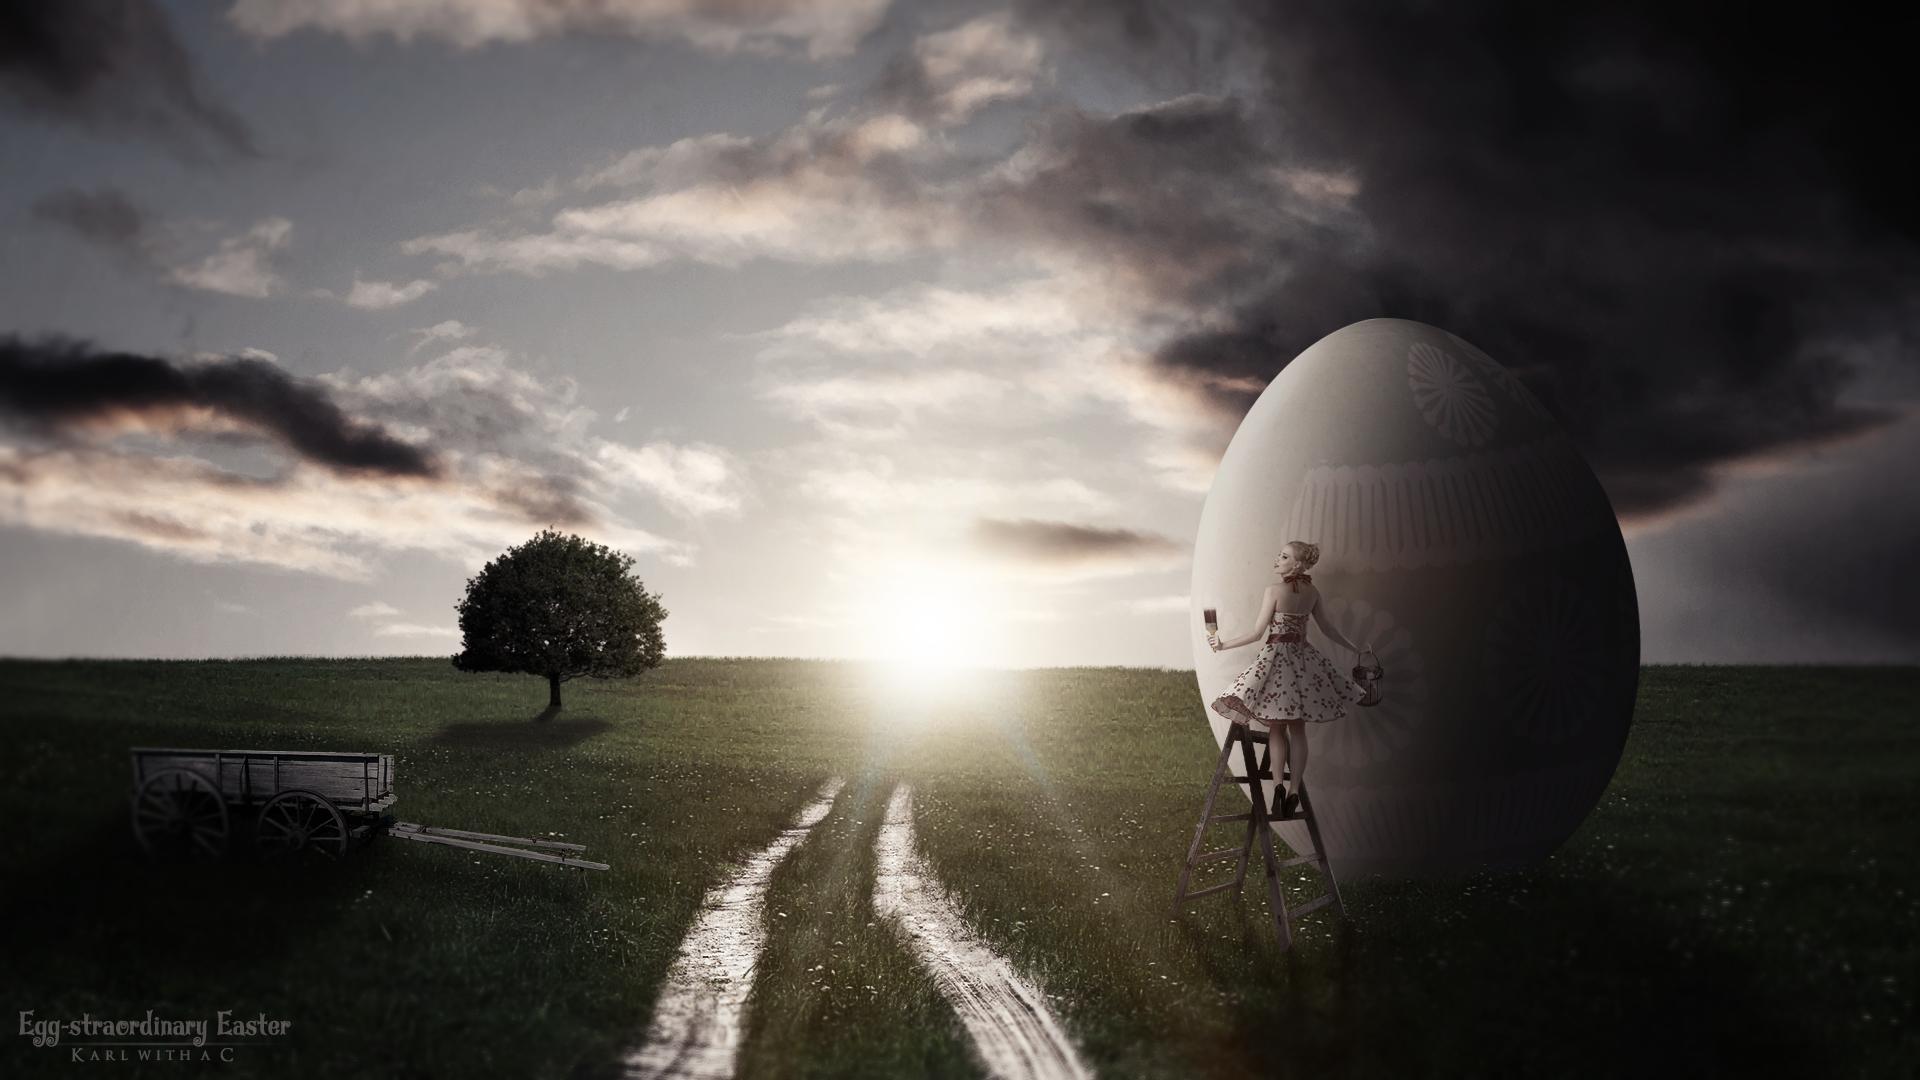 Egg-straordinary Easter by Karl-with-a-C.deviantart.com on @DeviantArt